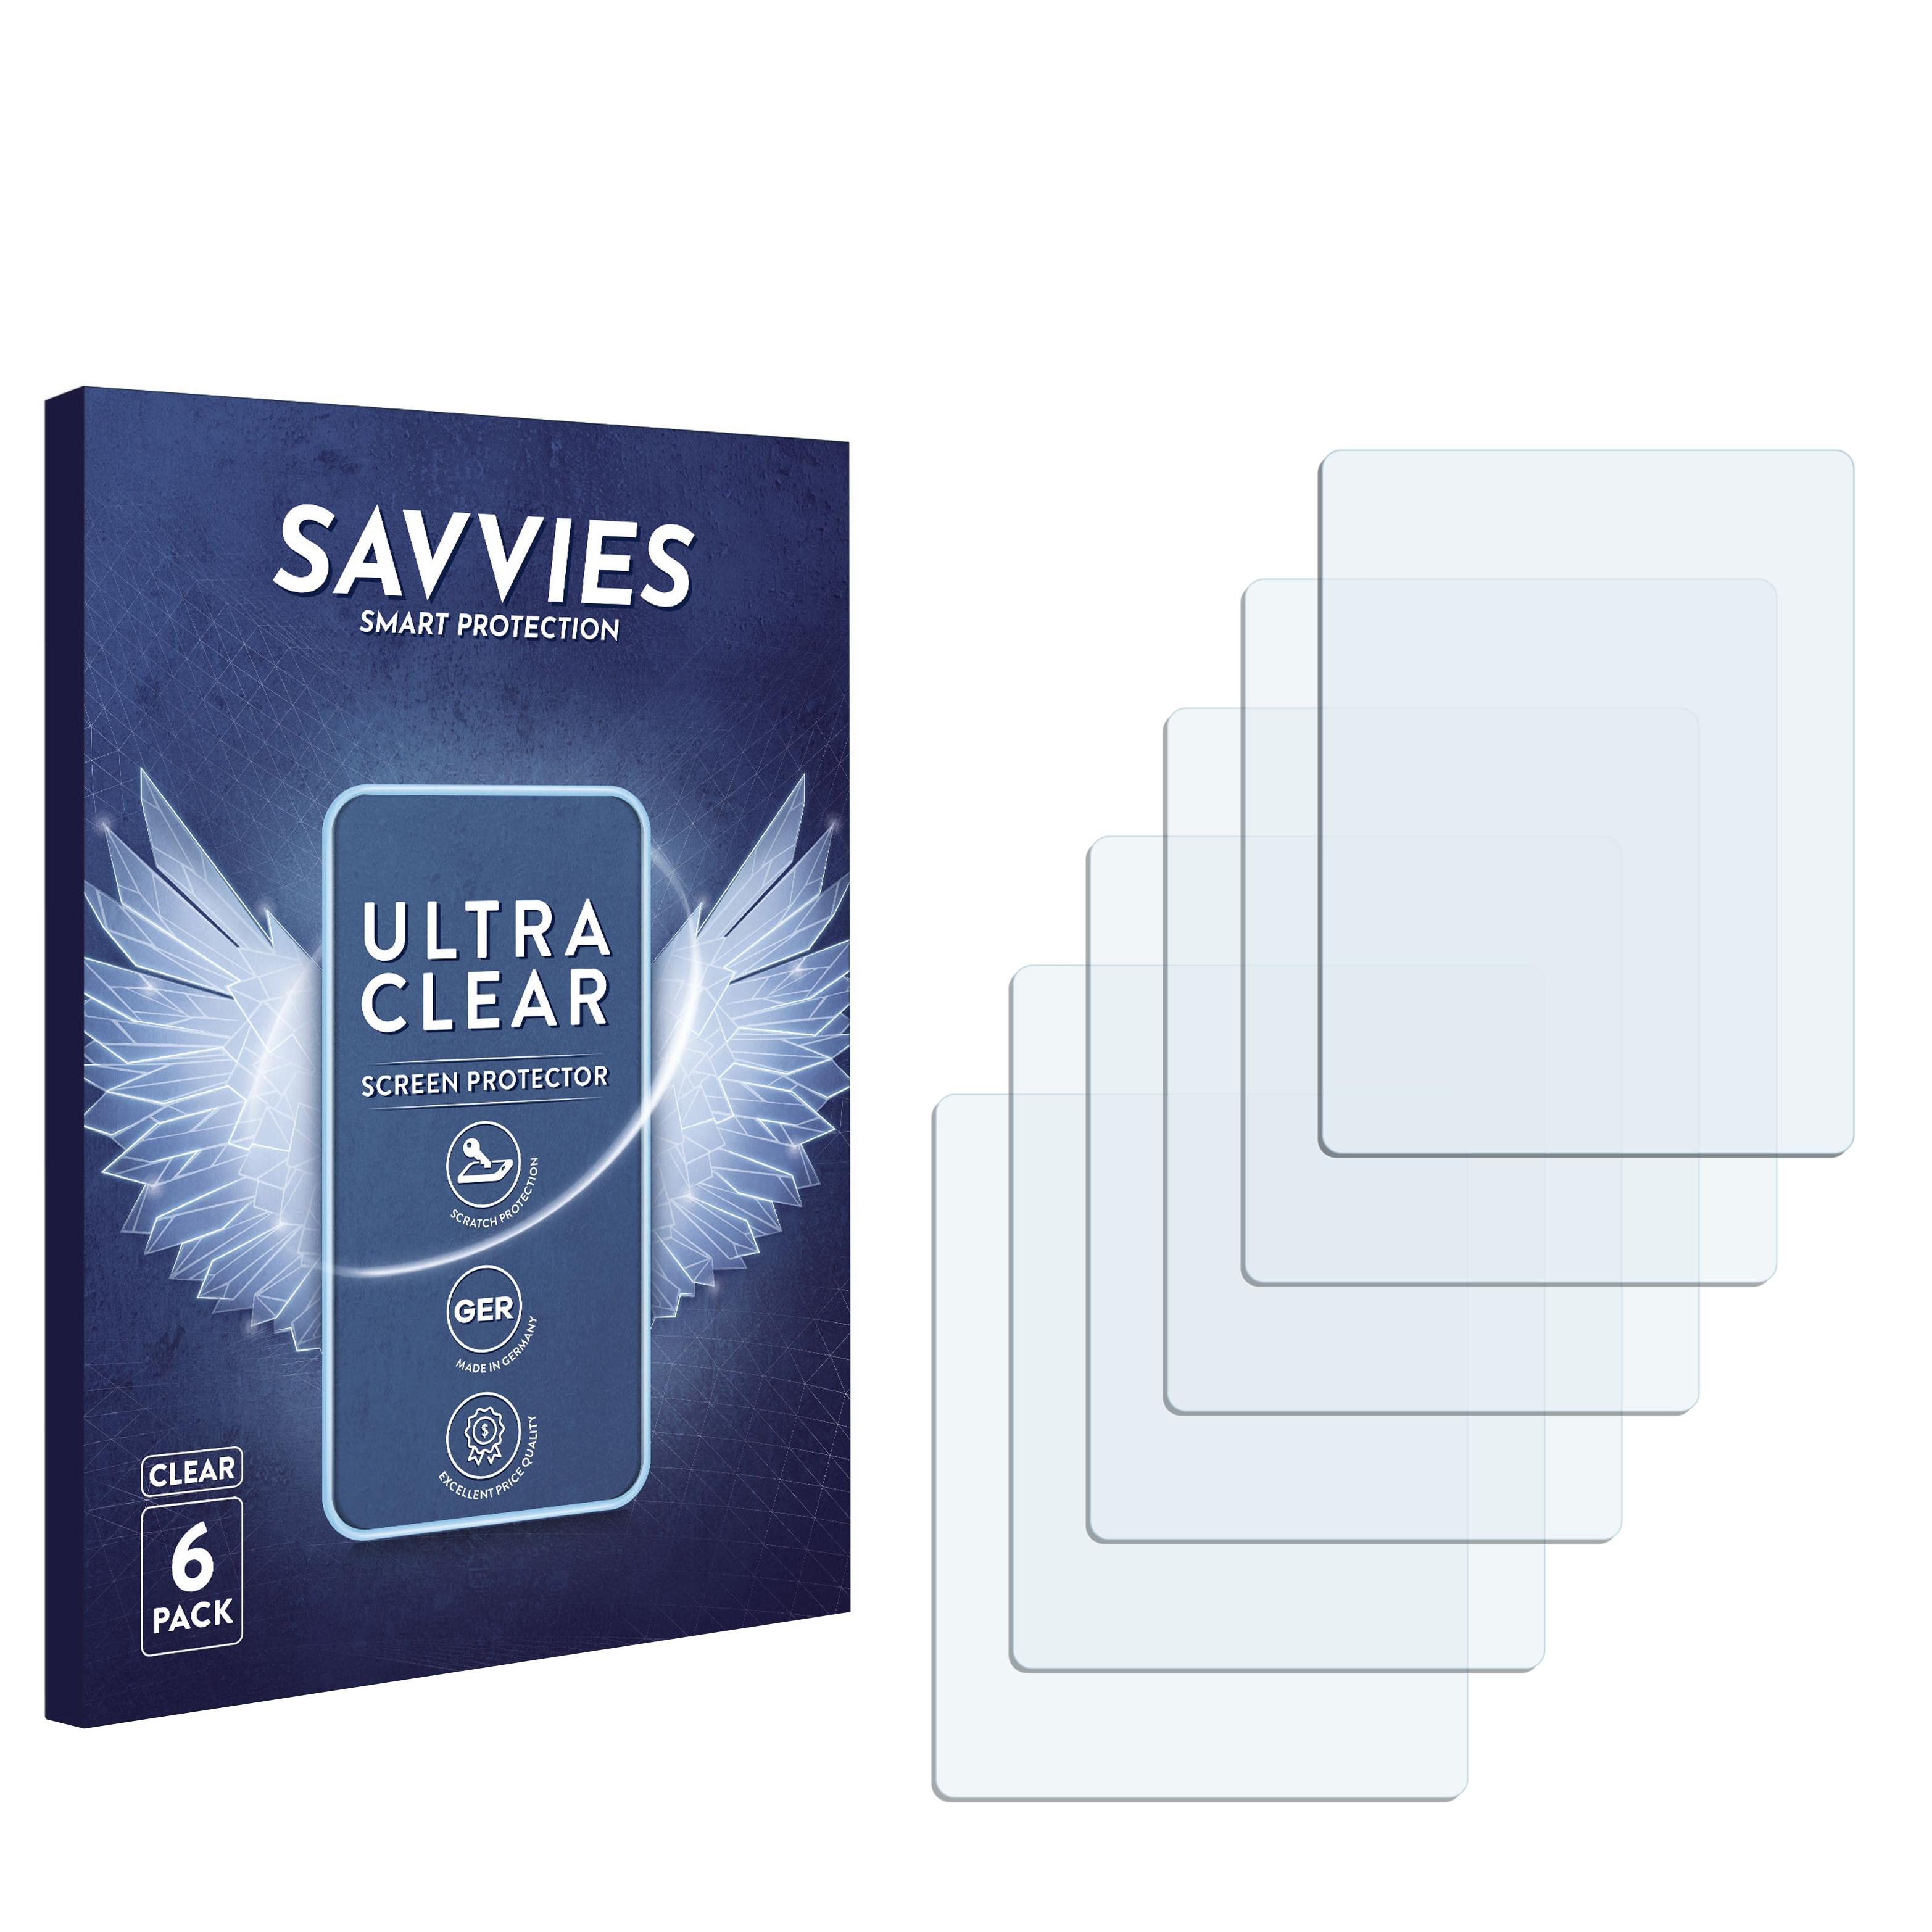 6x Savvies SU75 čirá ochranná fólie pro Alcatel One Touch OT-600